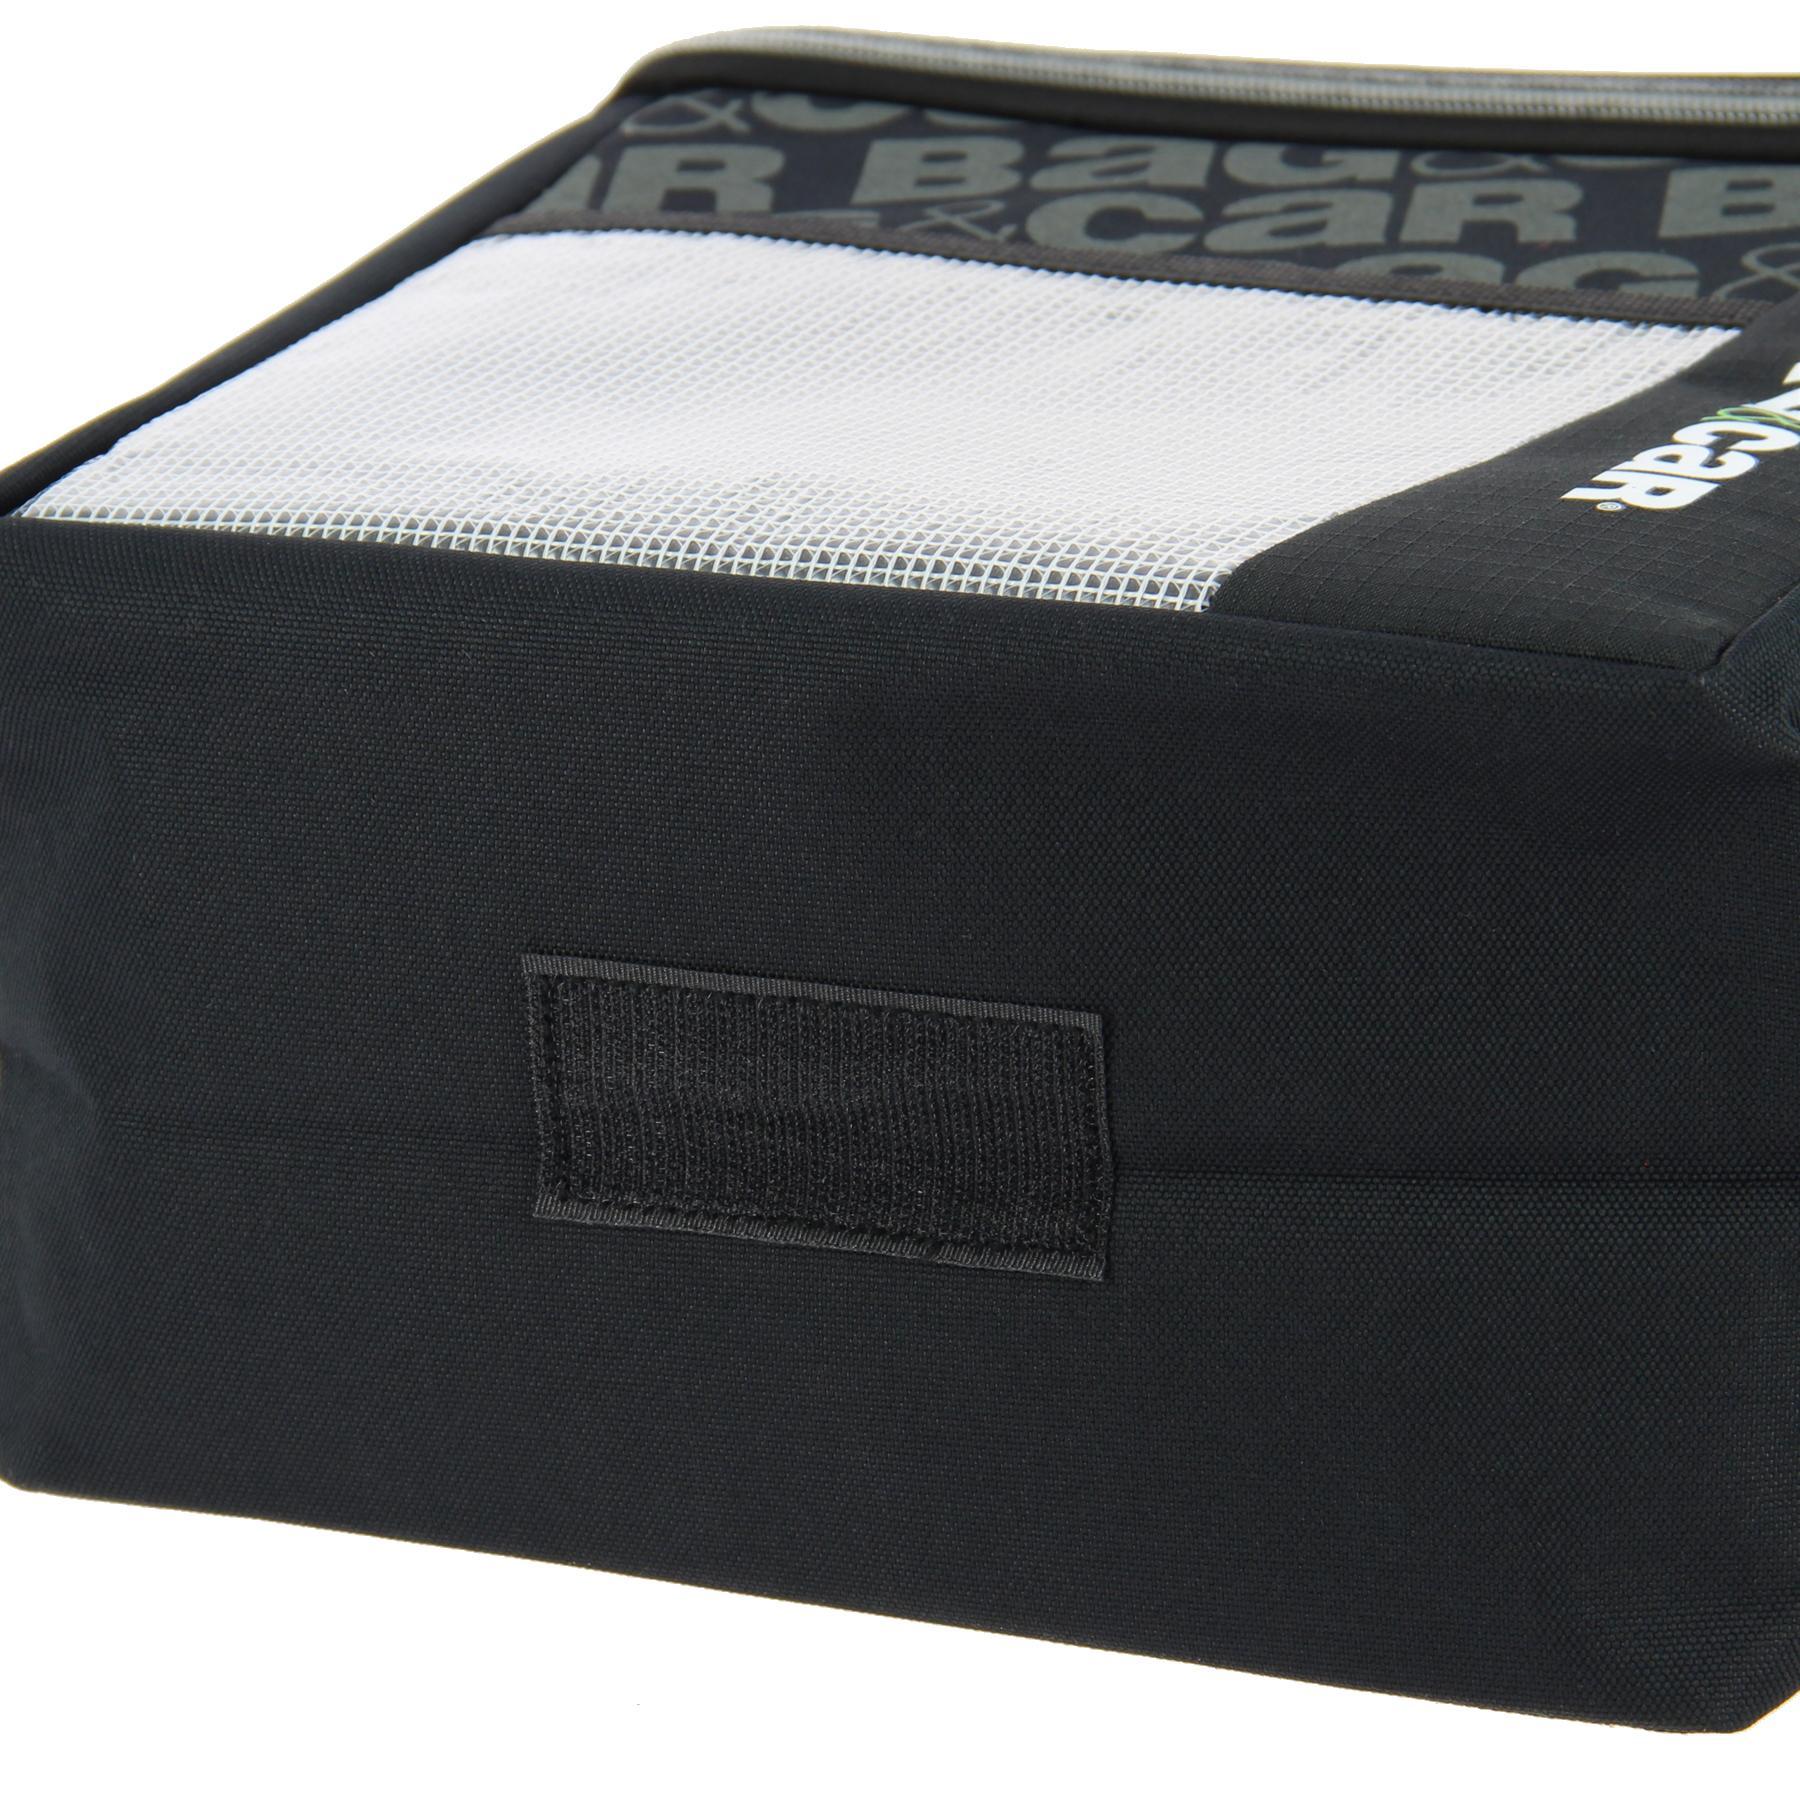 168002 Kühltasche BAG&CAR Test